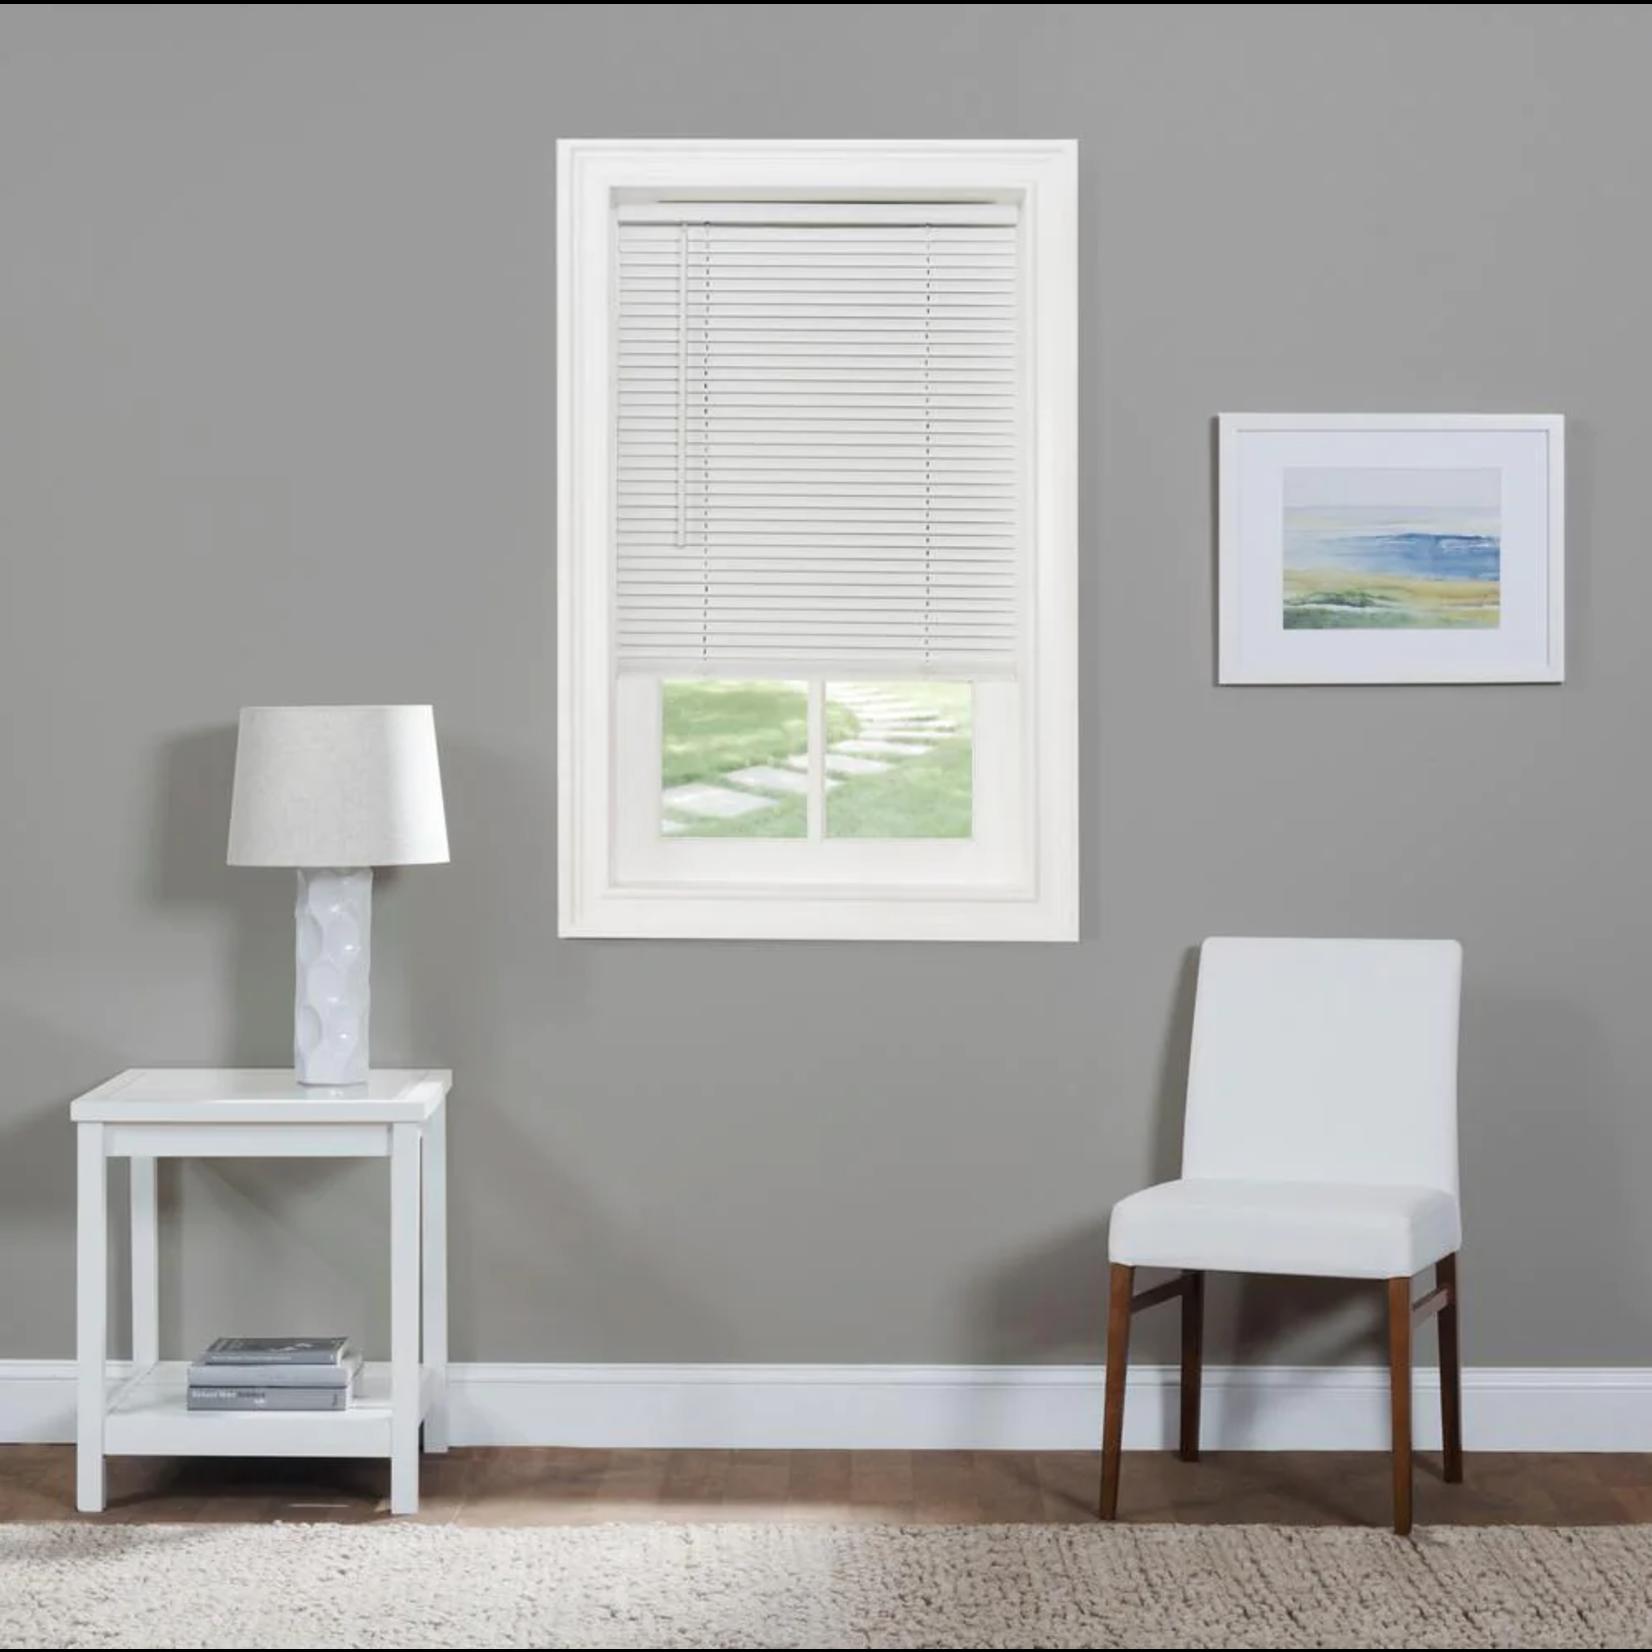 "*Wayfair Basics Semi-Sheer Horizontal/Venetian Blind 33"" x 64"" - Pearl White -  Hardware not included - Final Sale"